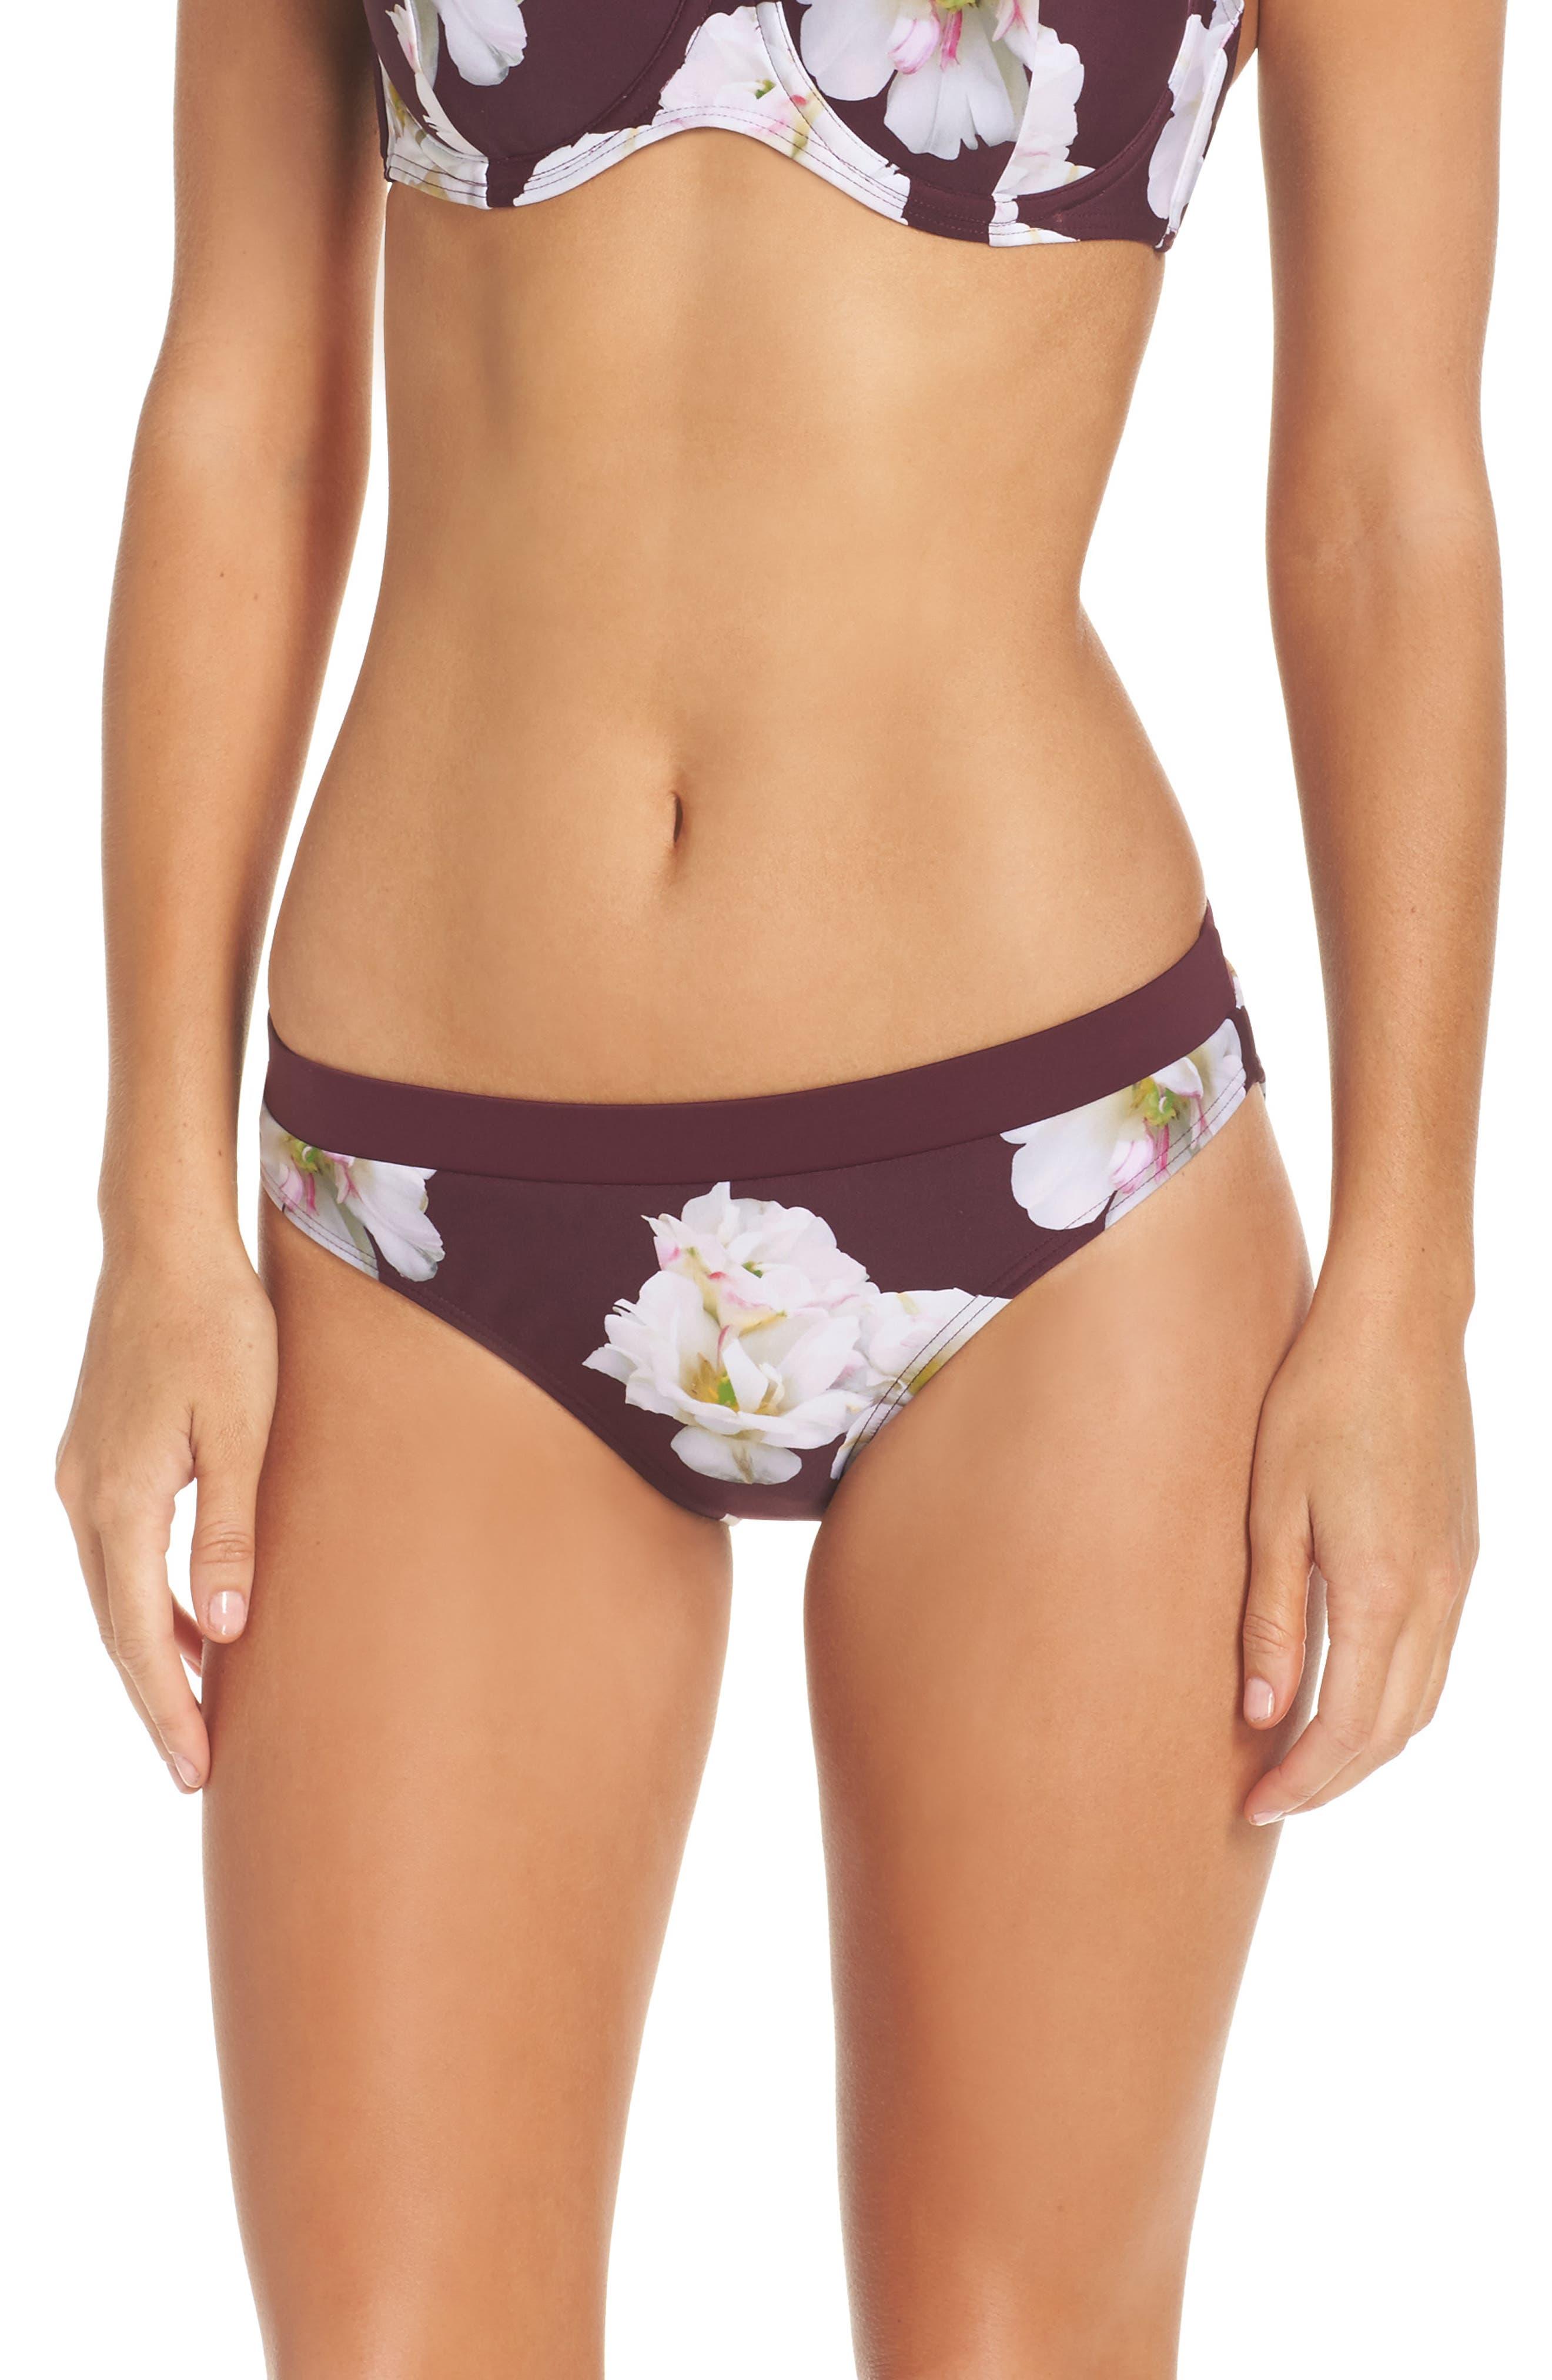 Garcela Gardenia Bikini Bottoms,                             Main thumbnail 1, color,                             930